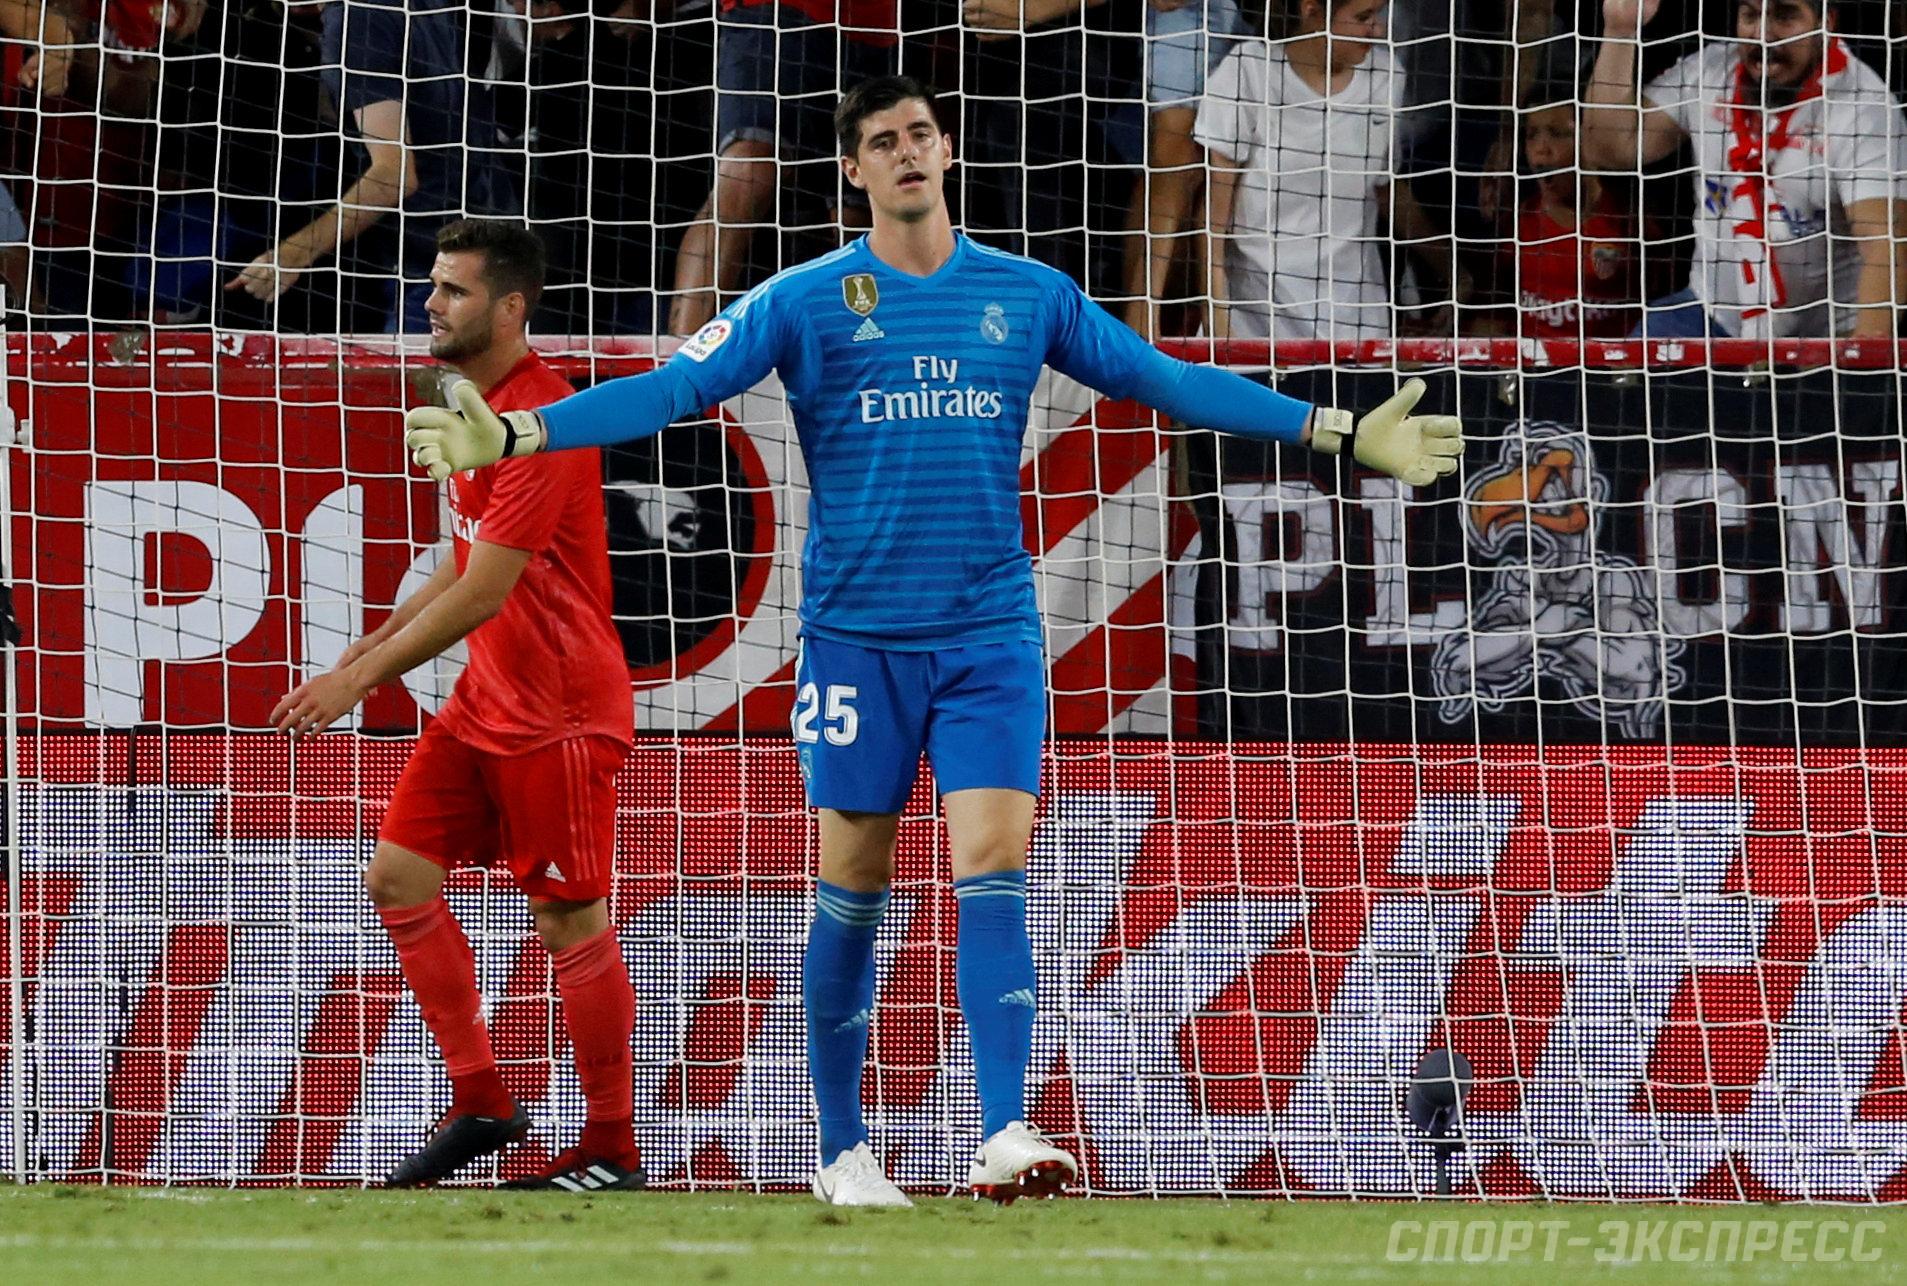 Прогноз на матч Севилья - Вильярреал 26 августа 2018